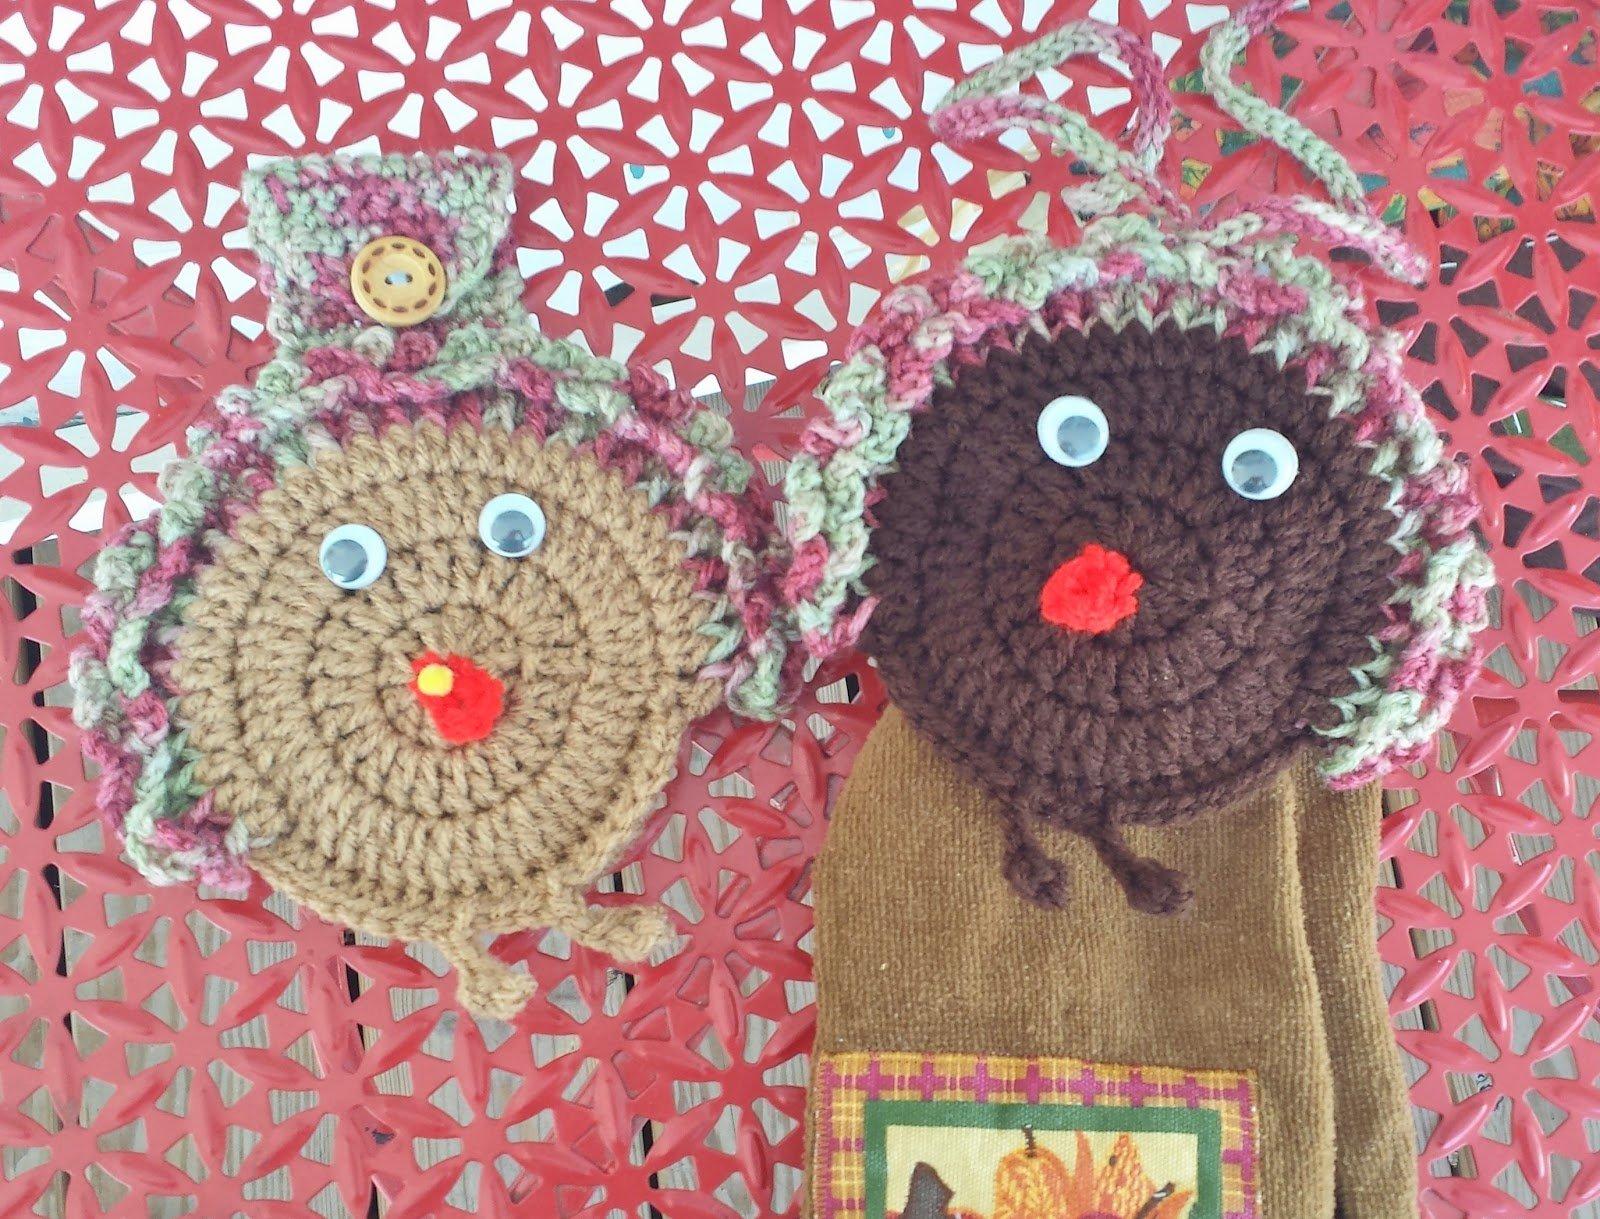 Turkey Gobble Towel Holder ~ DragonFlyMomof2 Designs